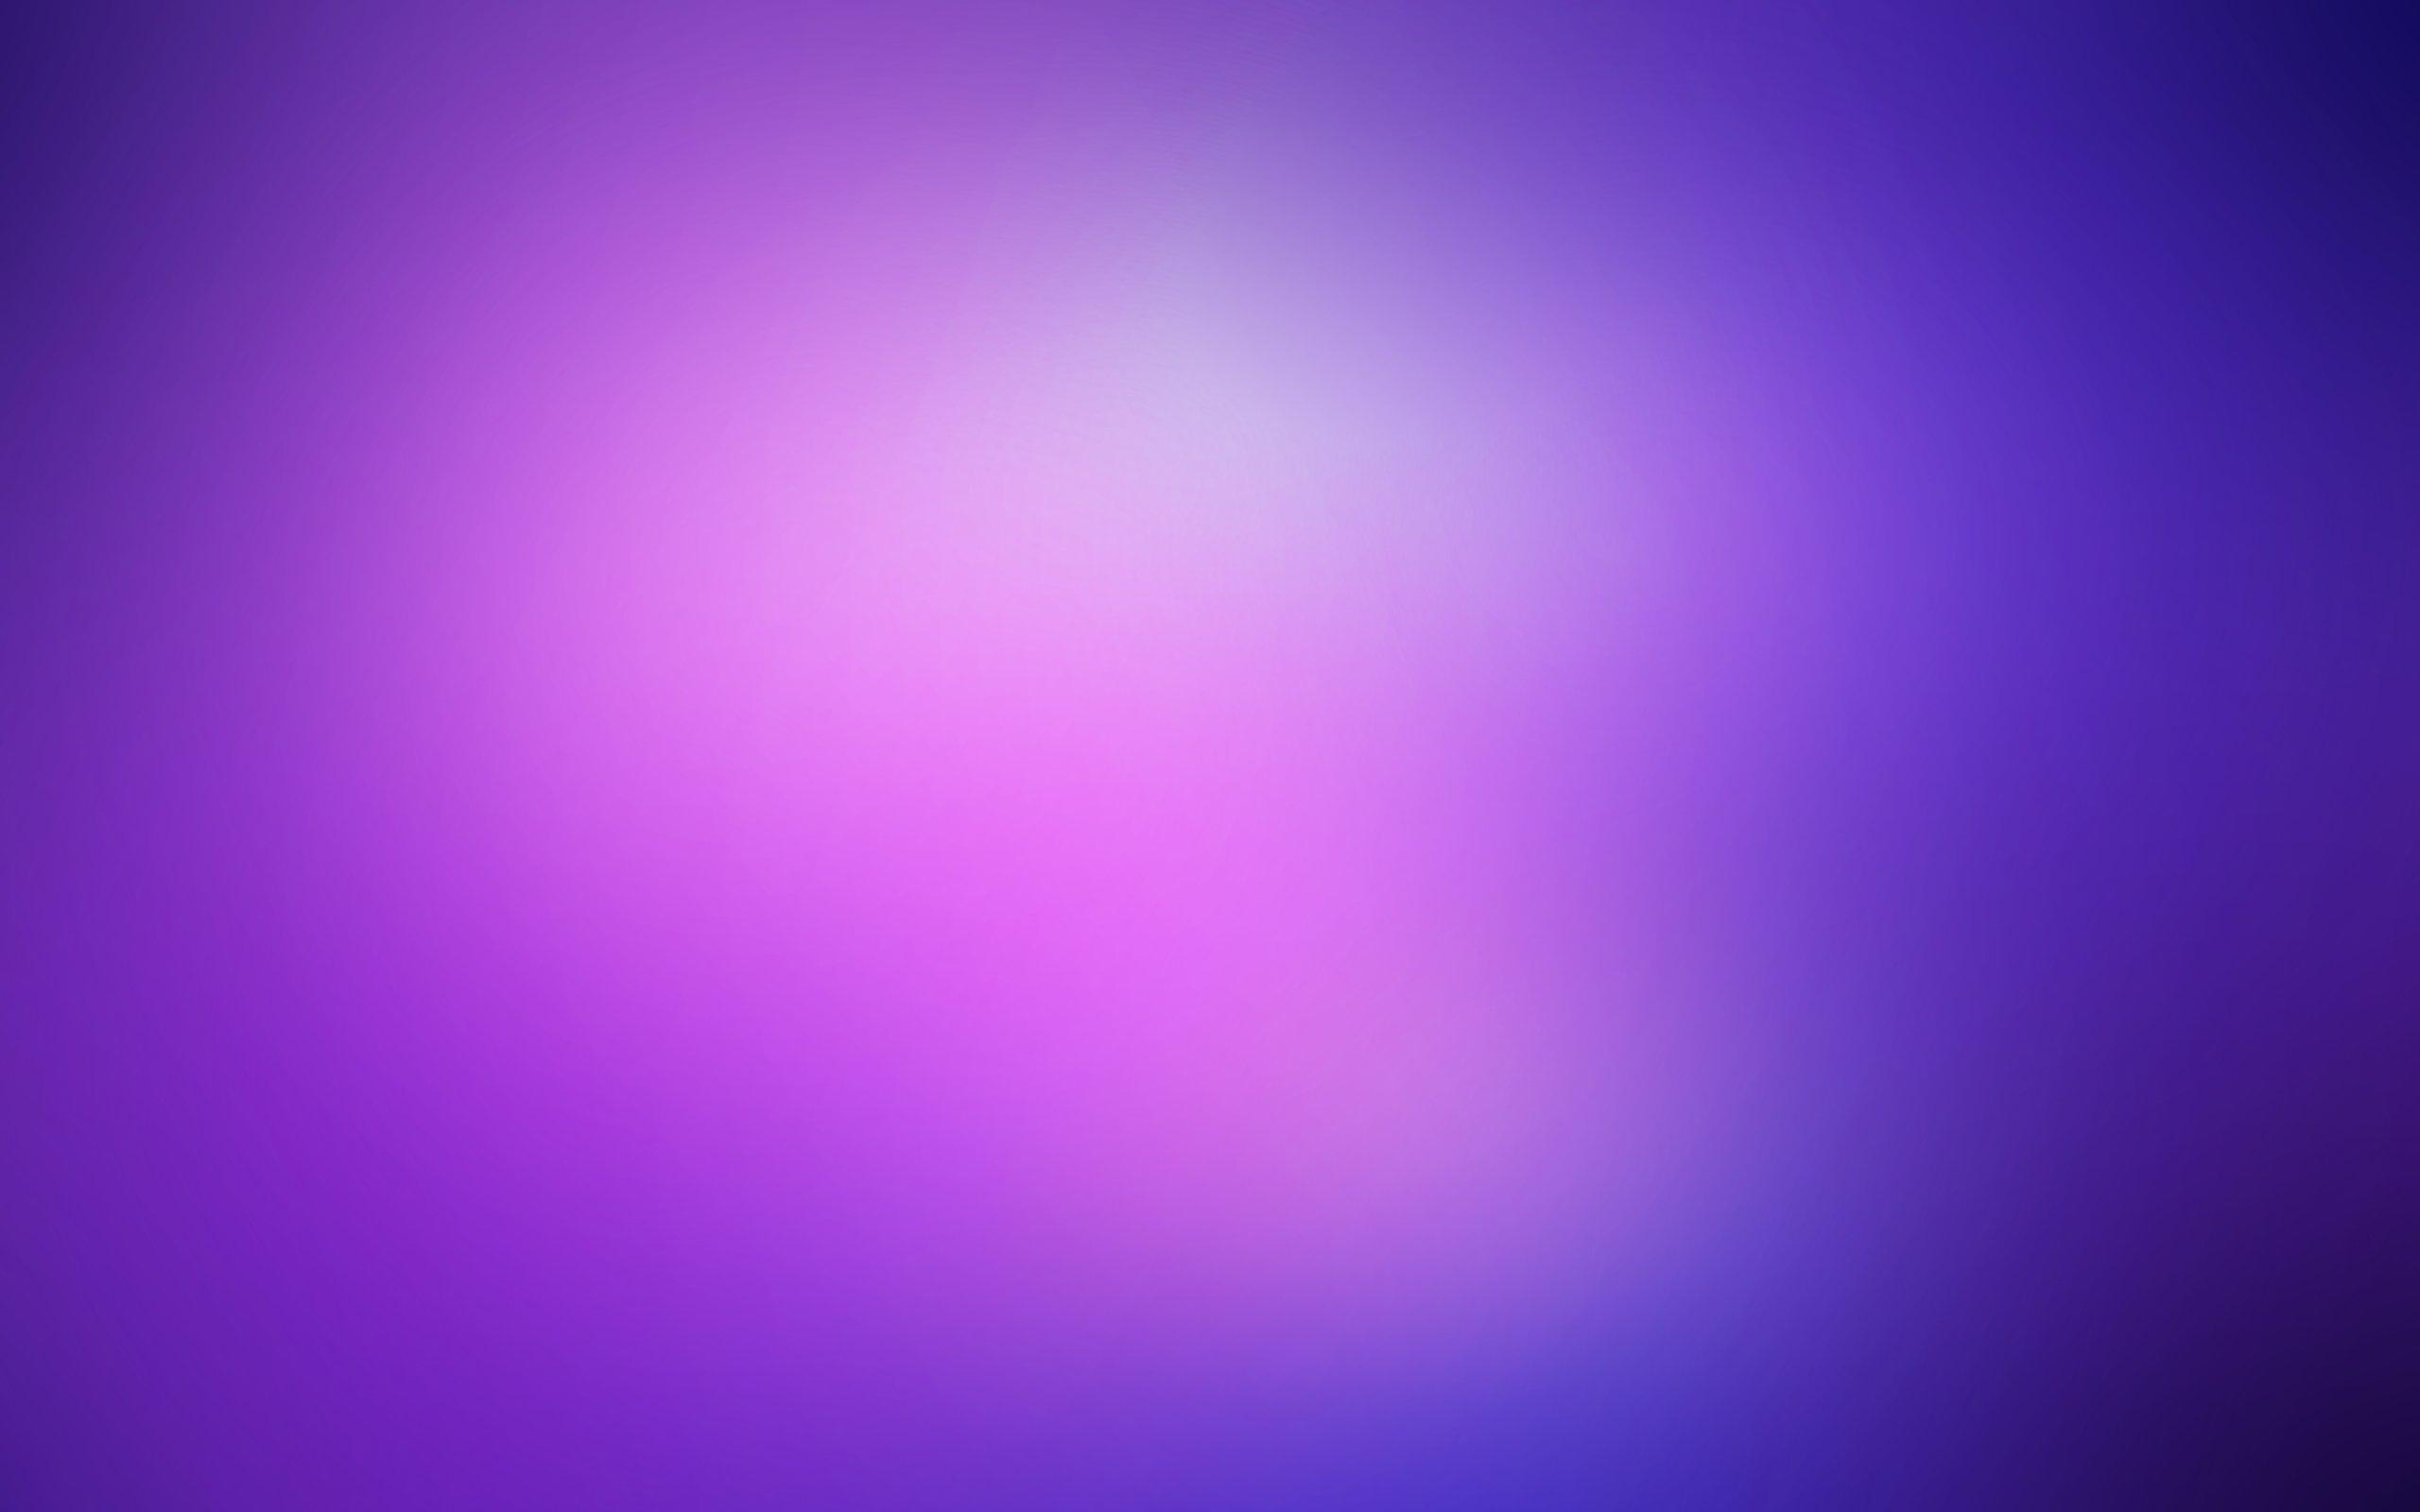 Solid Color Wallpaper 21963 2560x1600 px